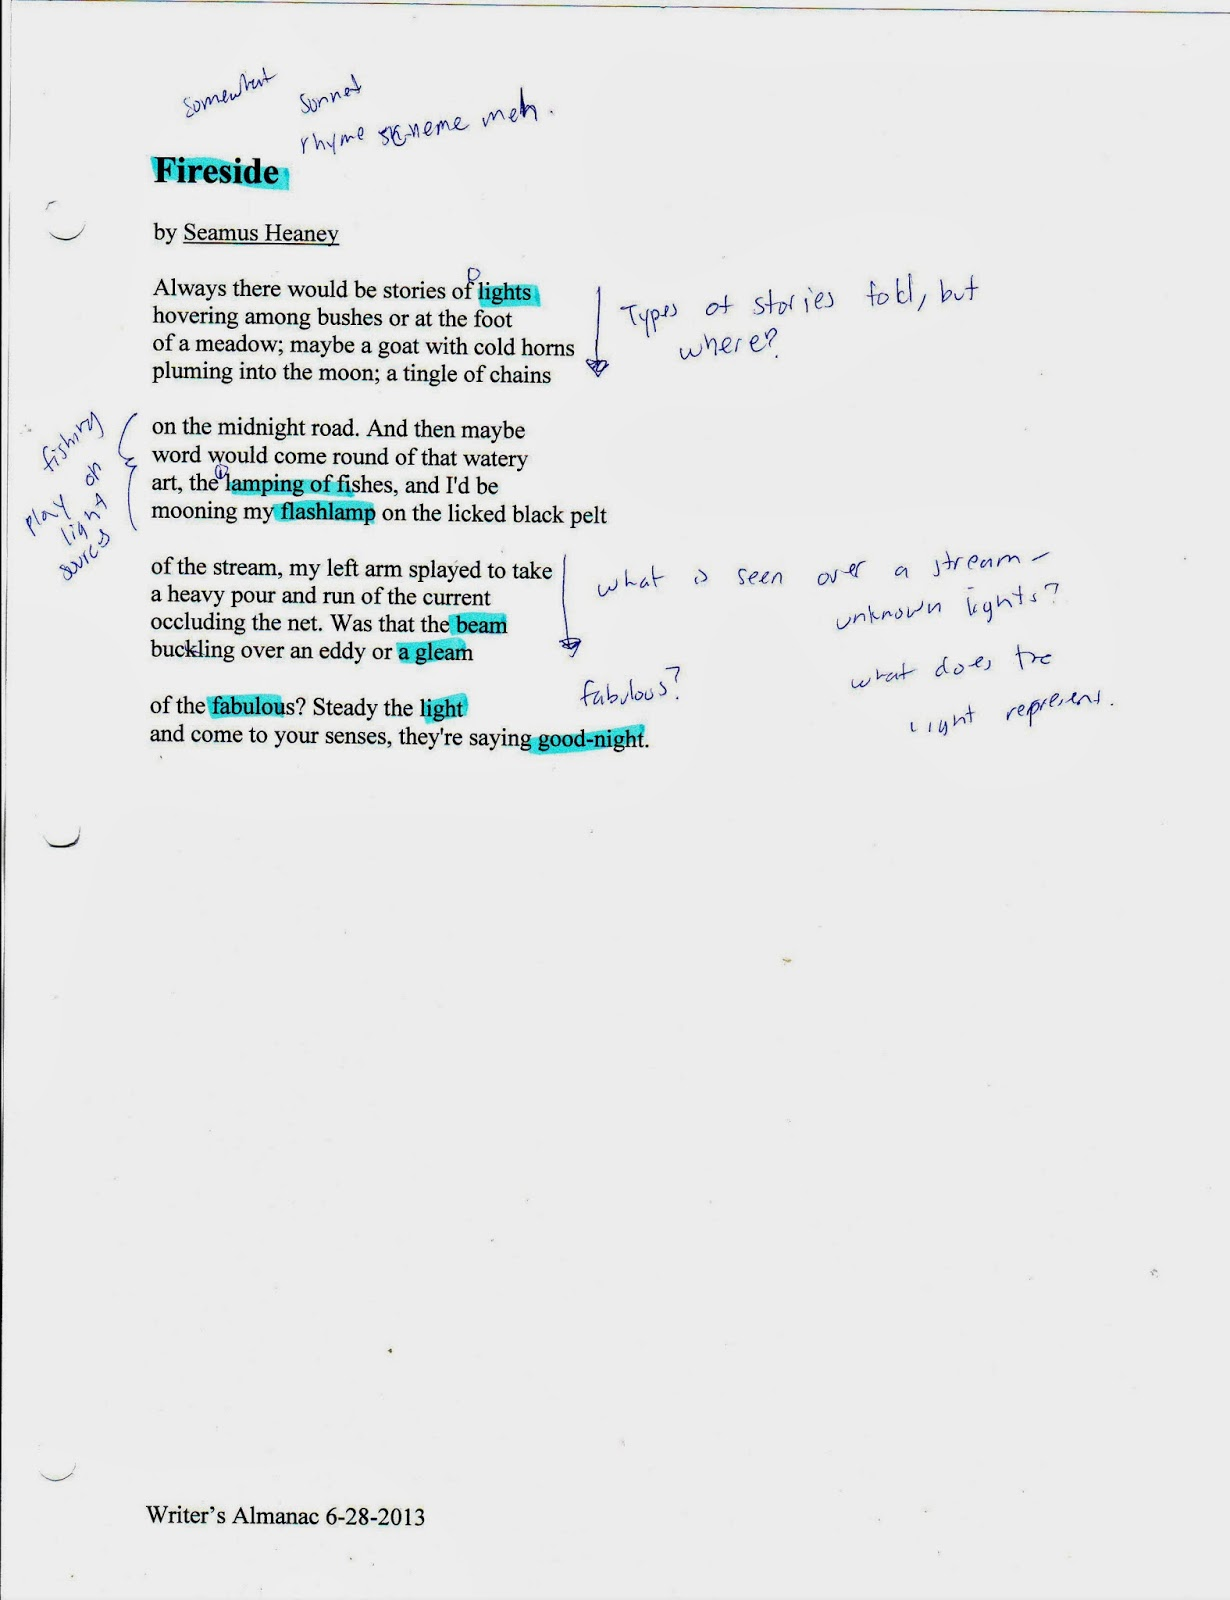 quatrain poems examples - photo #24